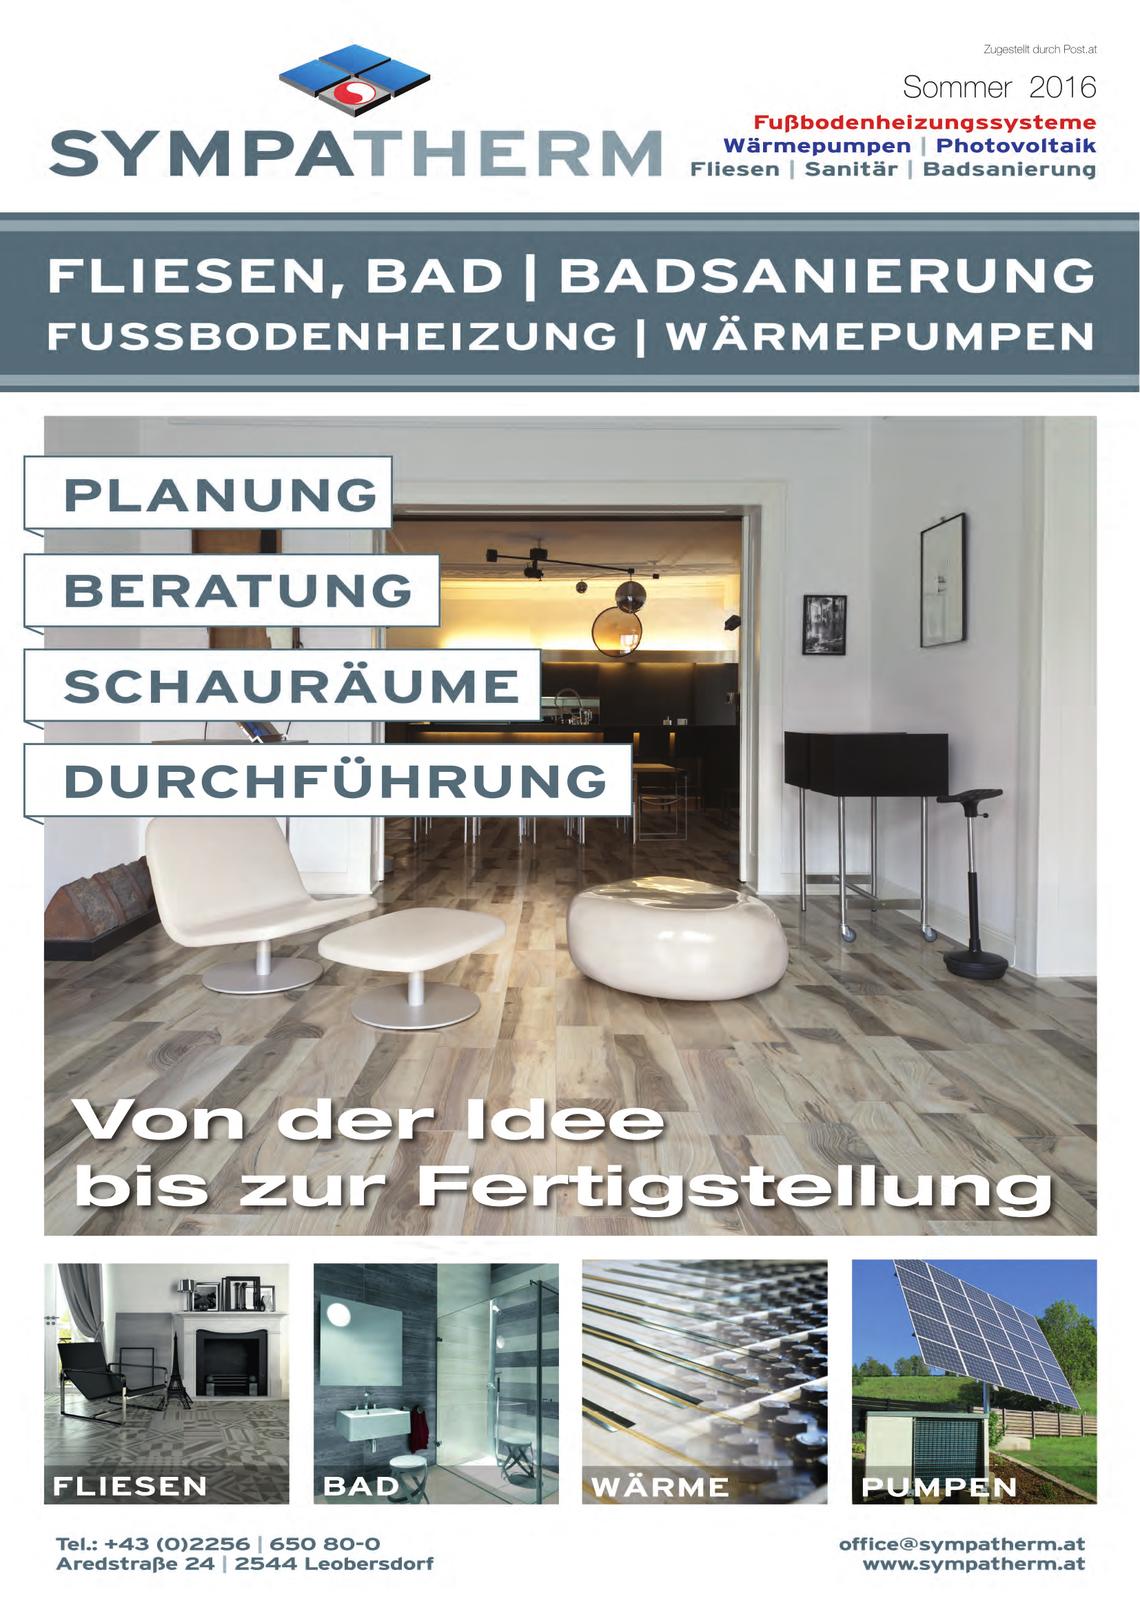 Sympatherm Flugblatt 02/2016